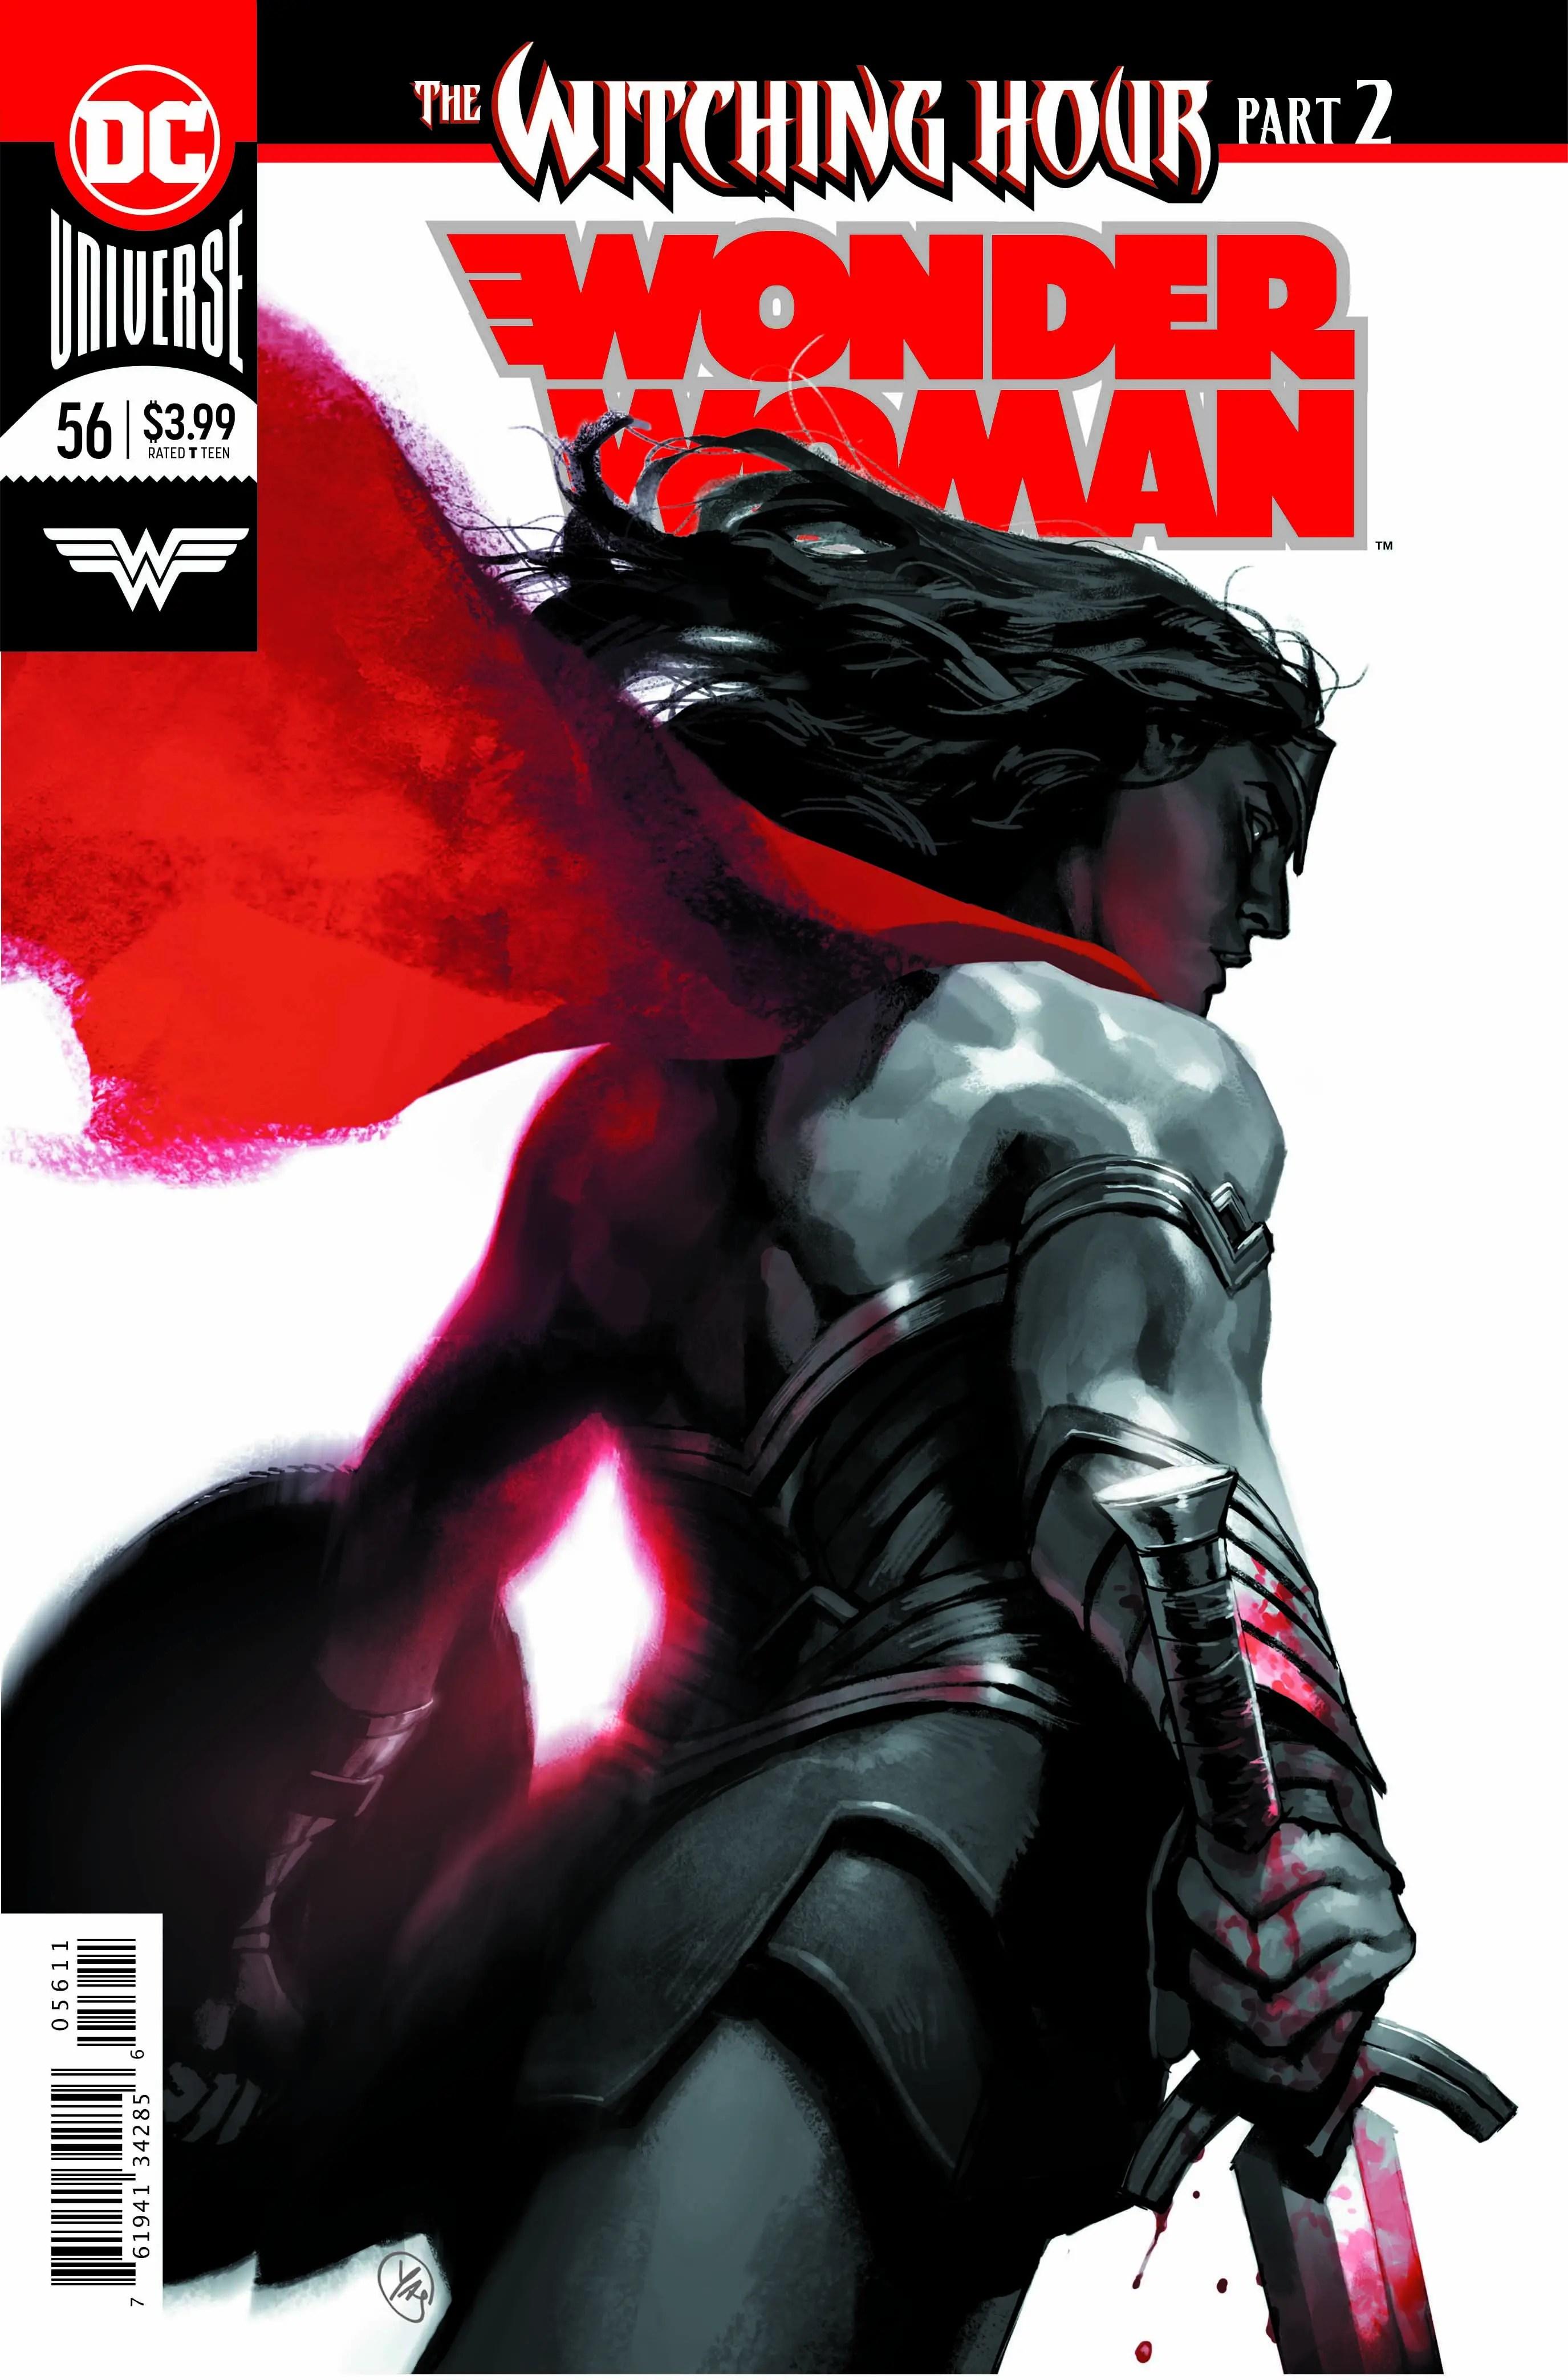 Wonder Woman #56 review: Sophomore slump